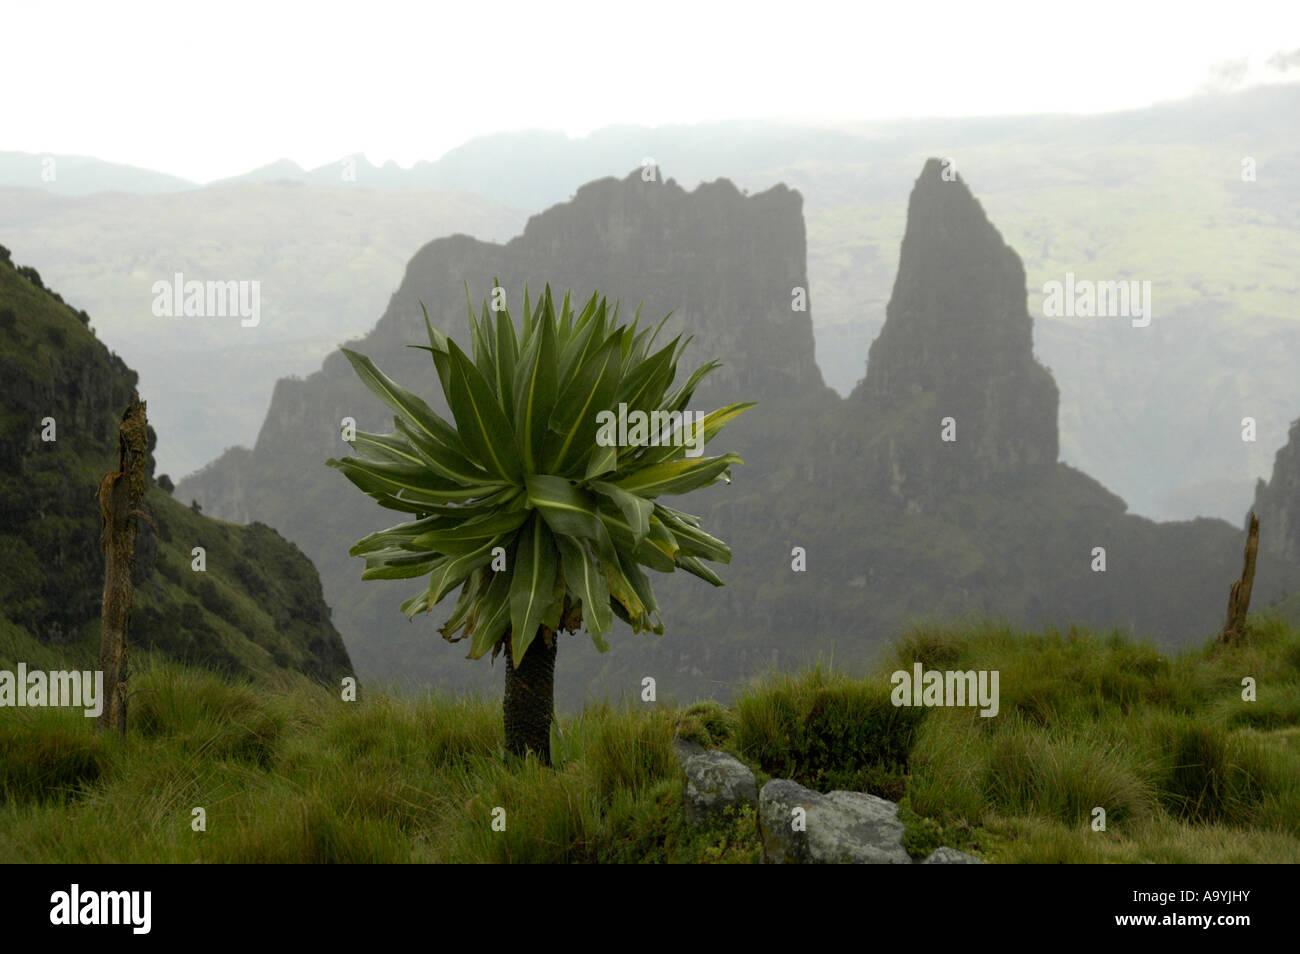 Giant Lobelias Lobelia rhynchopetalum in front of craggy mountain formations in the Semien Mountains near Debark Stock Photo